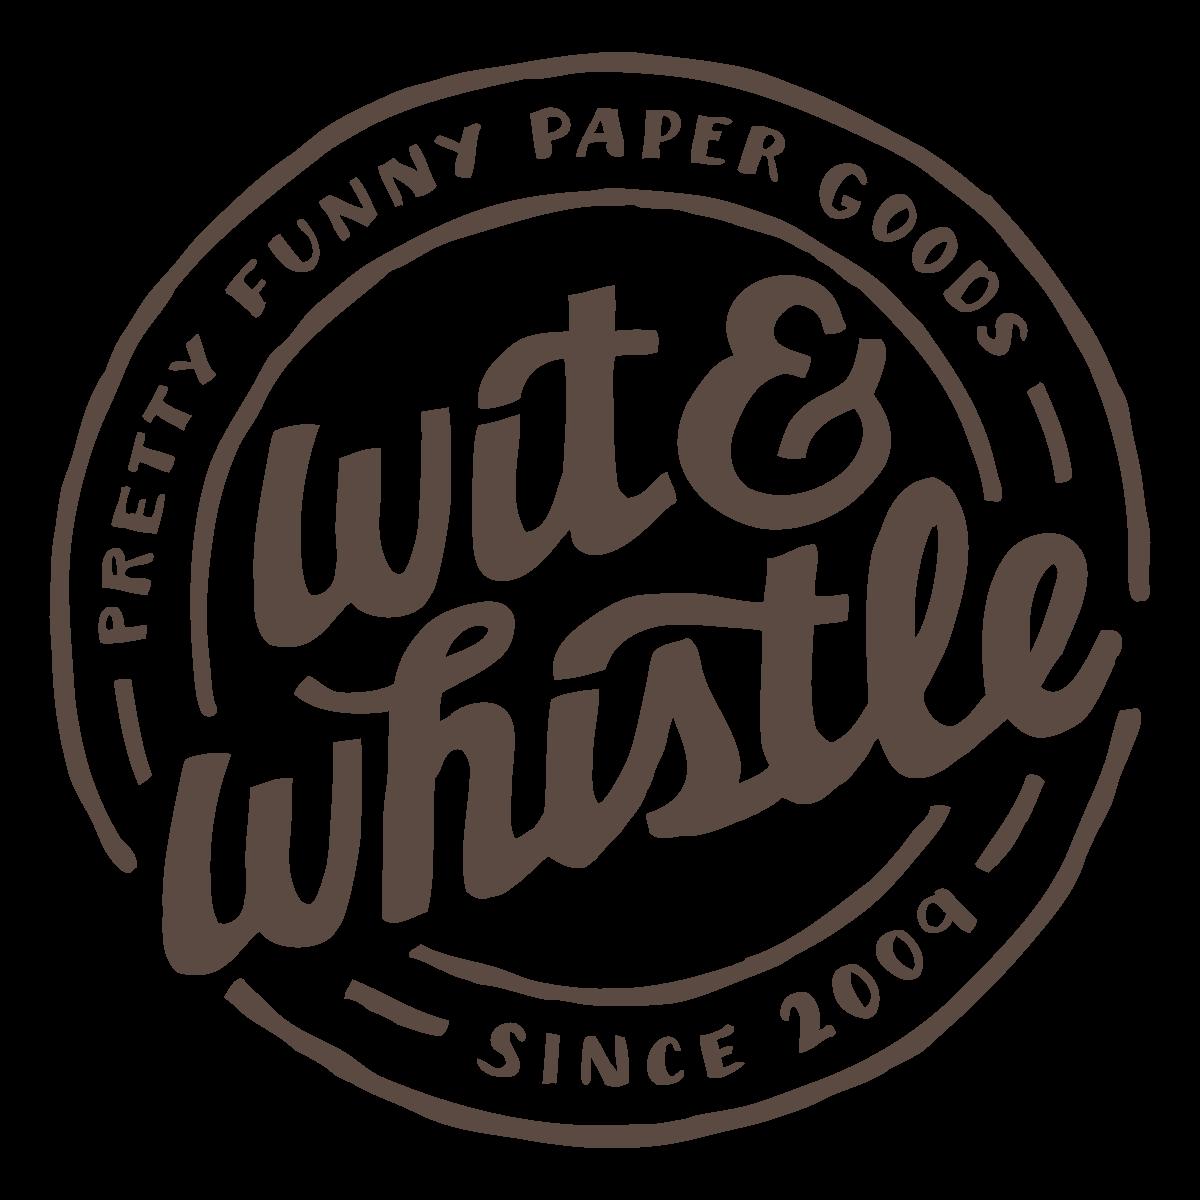 Wit & Whistle logo